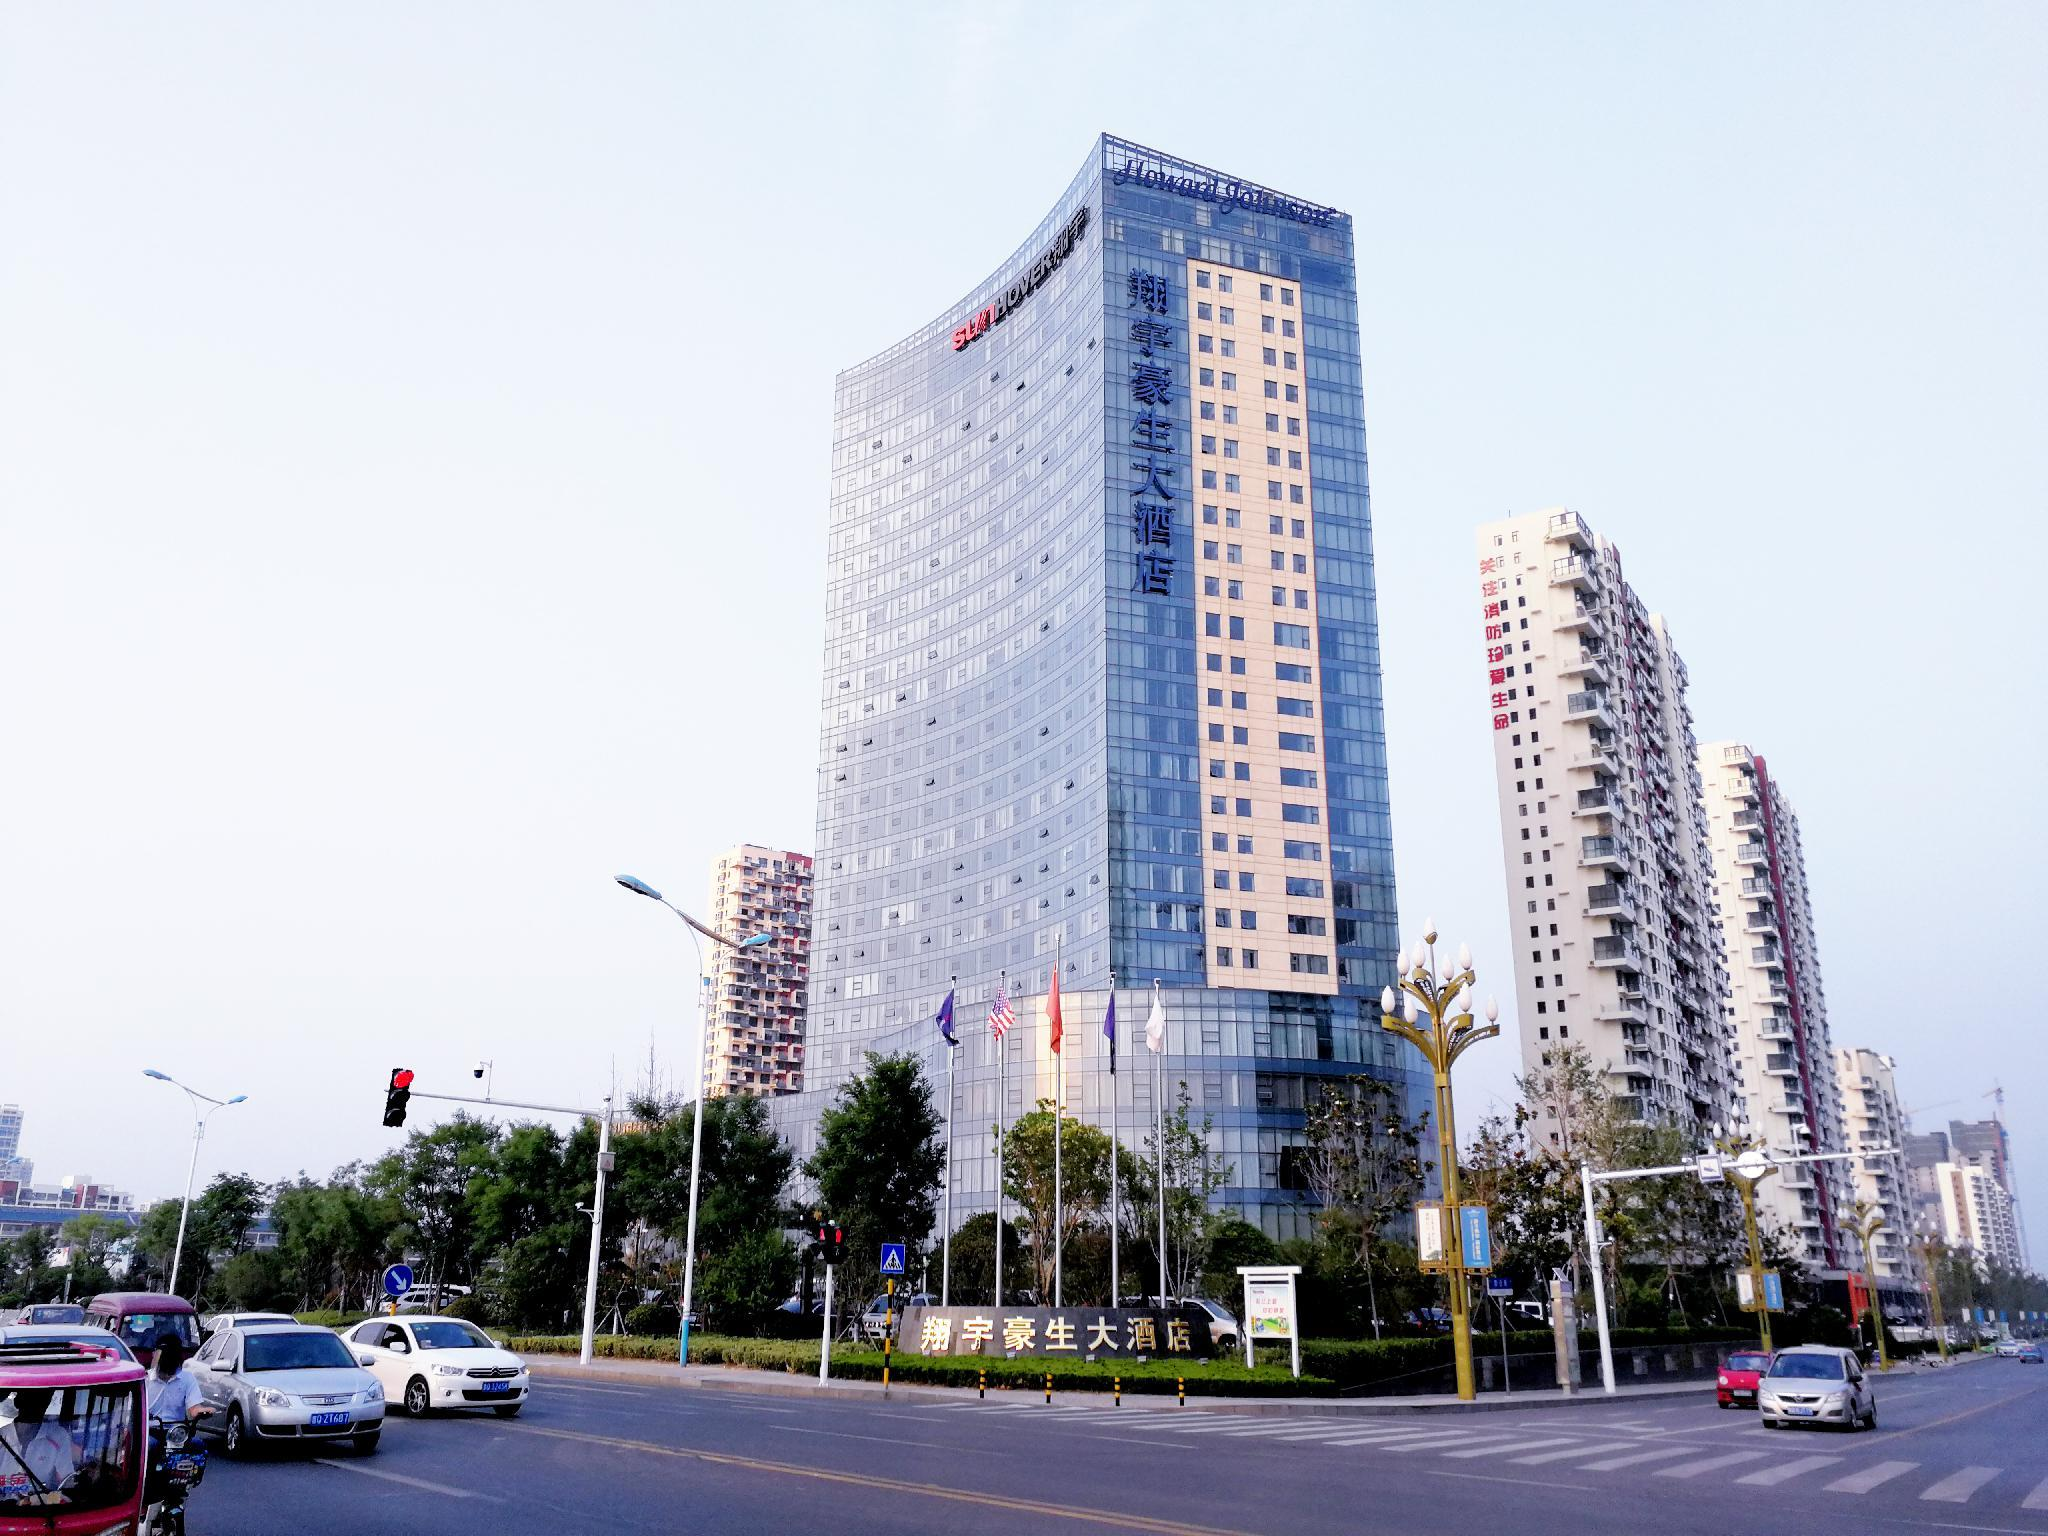 Howard Johnson Xiangyu Plaza Linyi